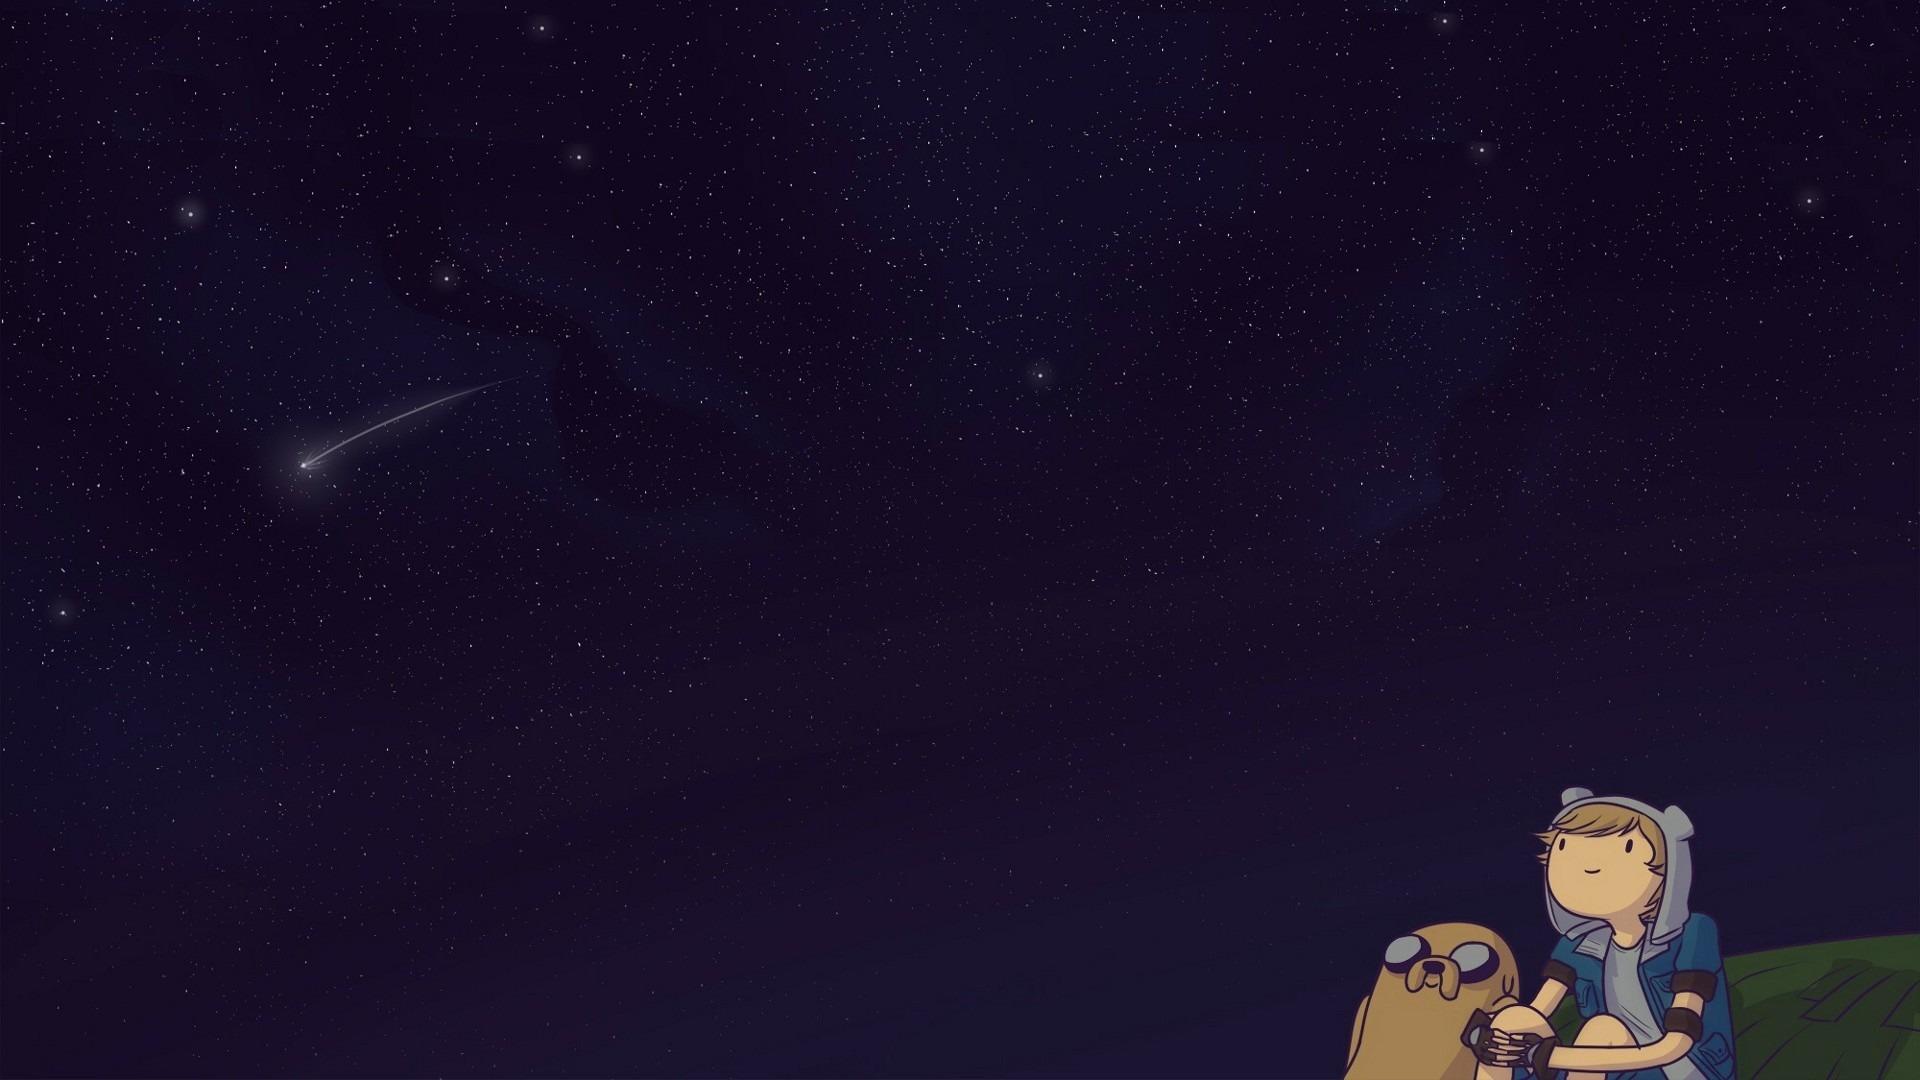 Время приключений ночь звезды время приключений